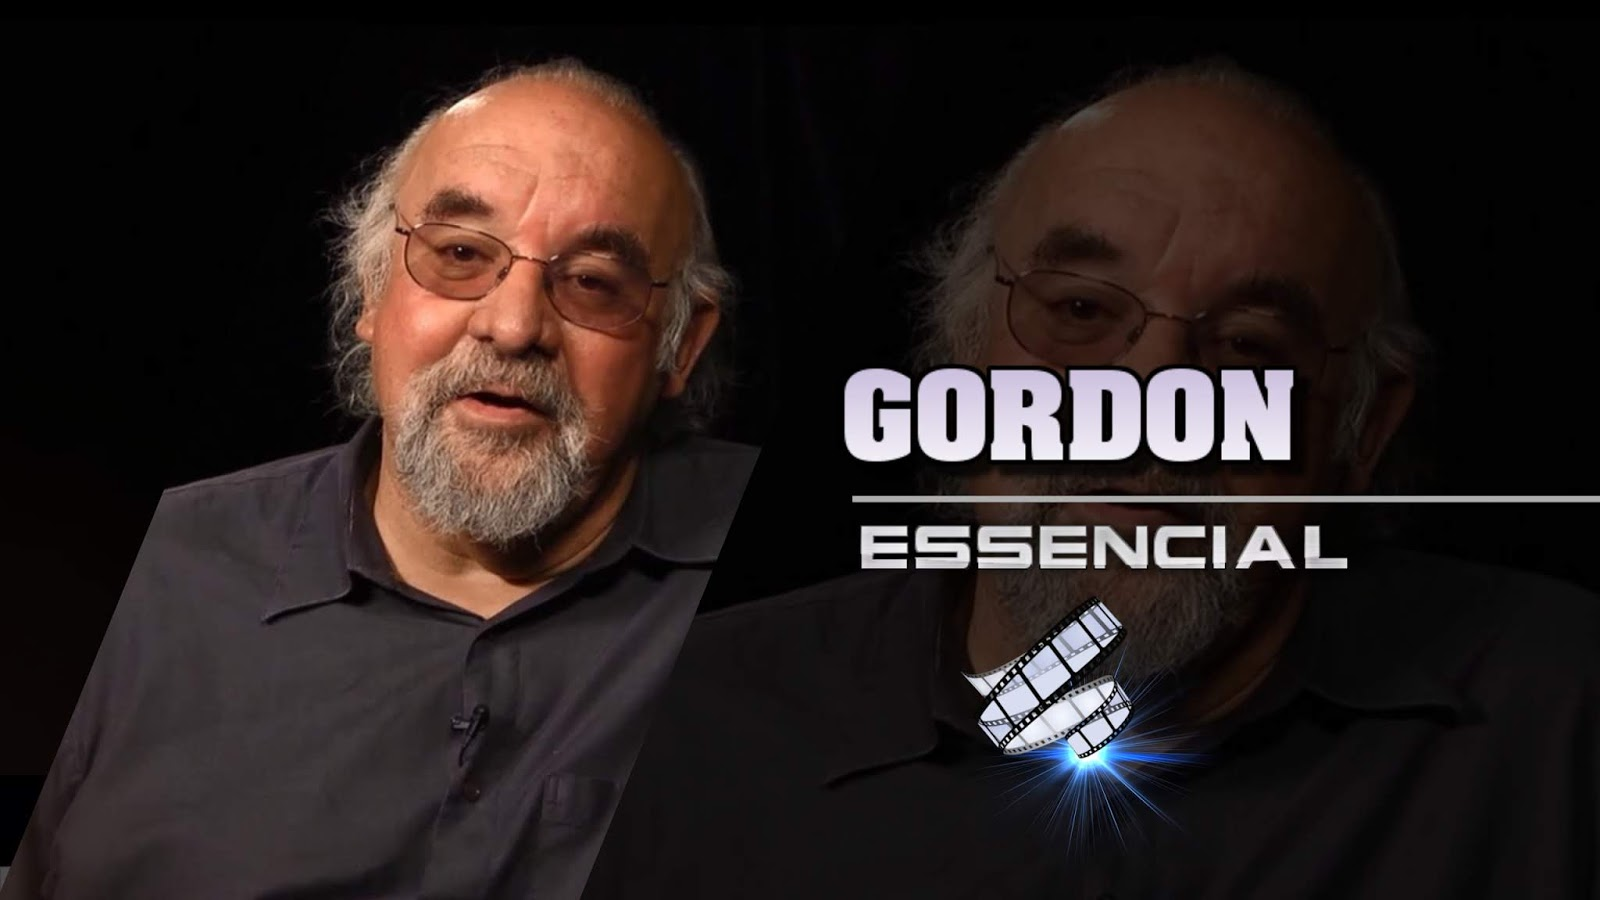 stuart-gordon-10-filmes-essenciais